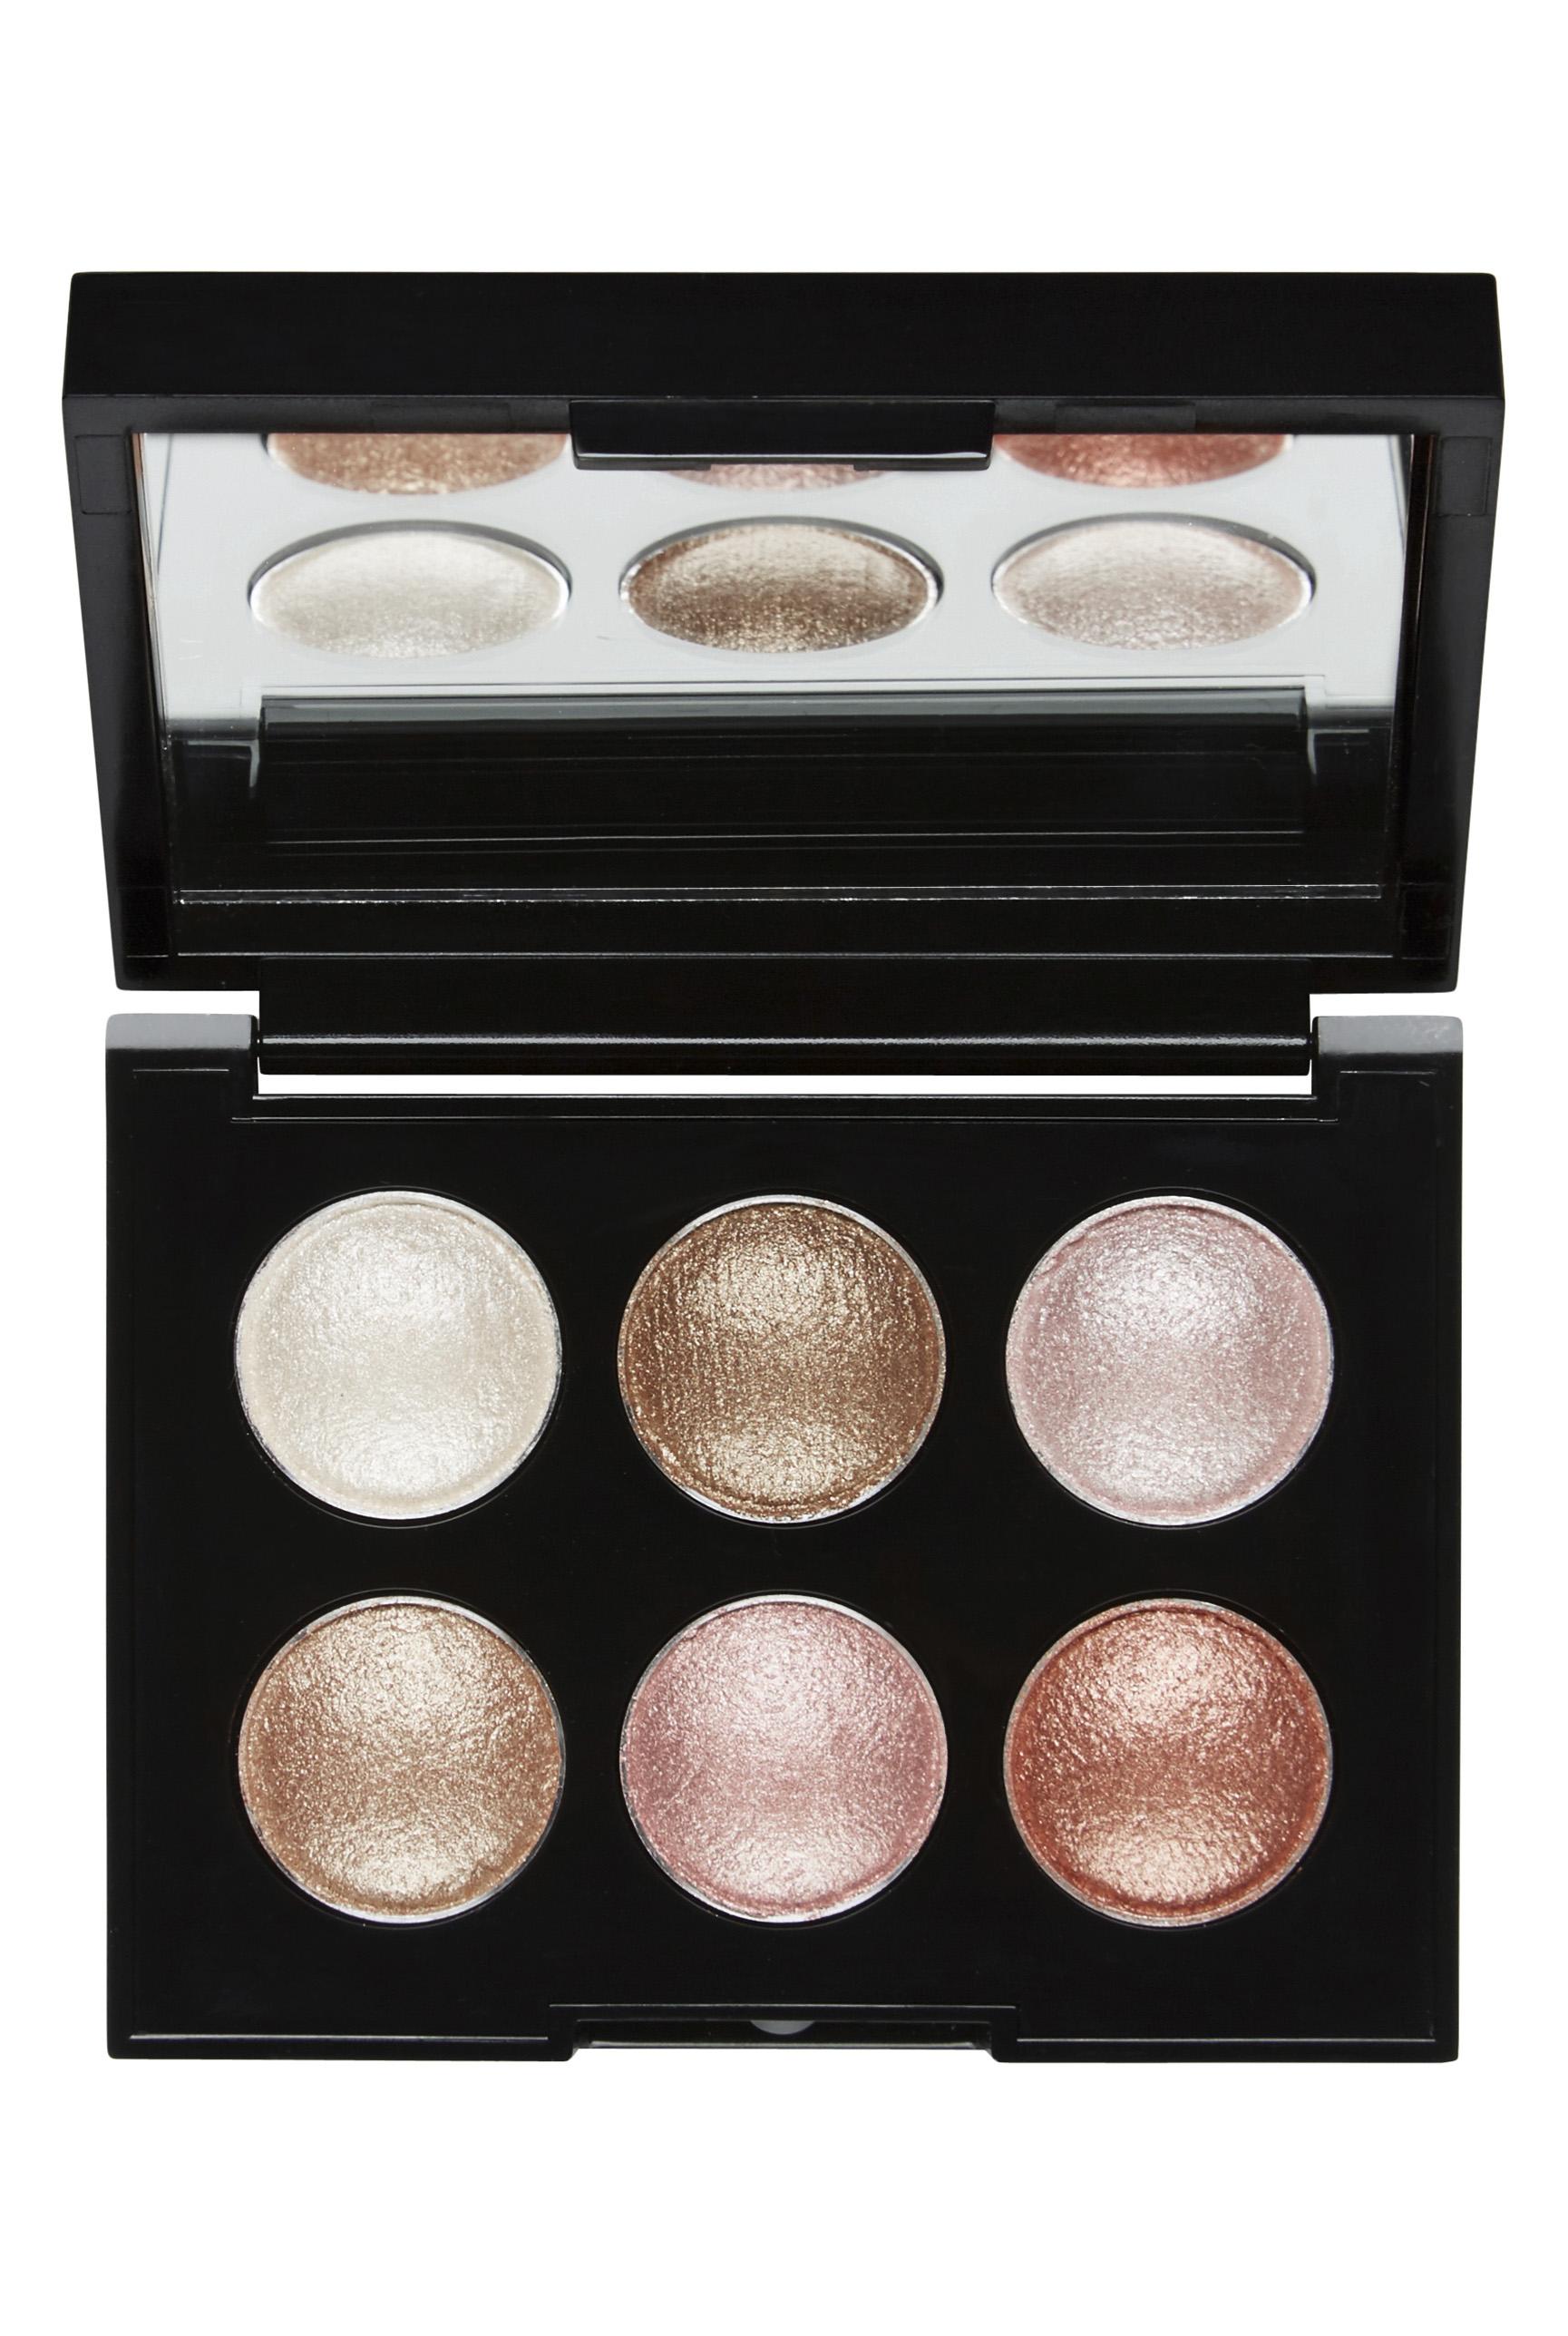 60202599_witchery-beauty-baked-eyeshadow-palette-in-bronze-rrp29-90